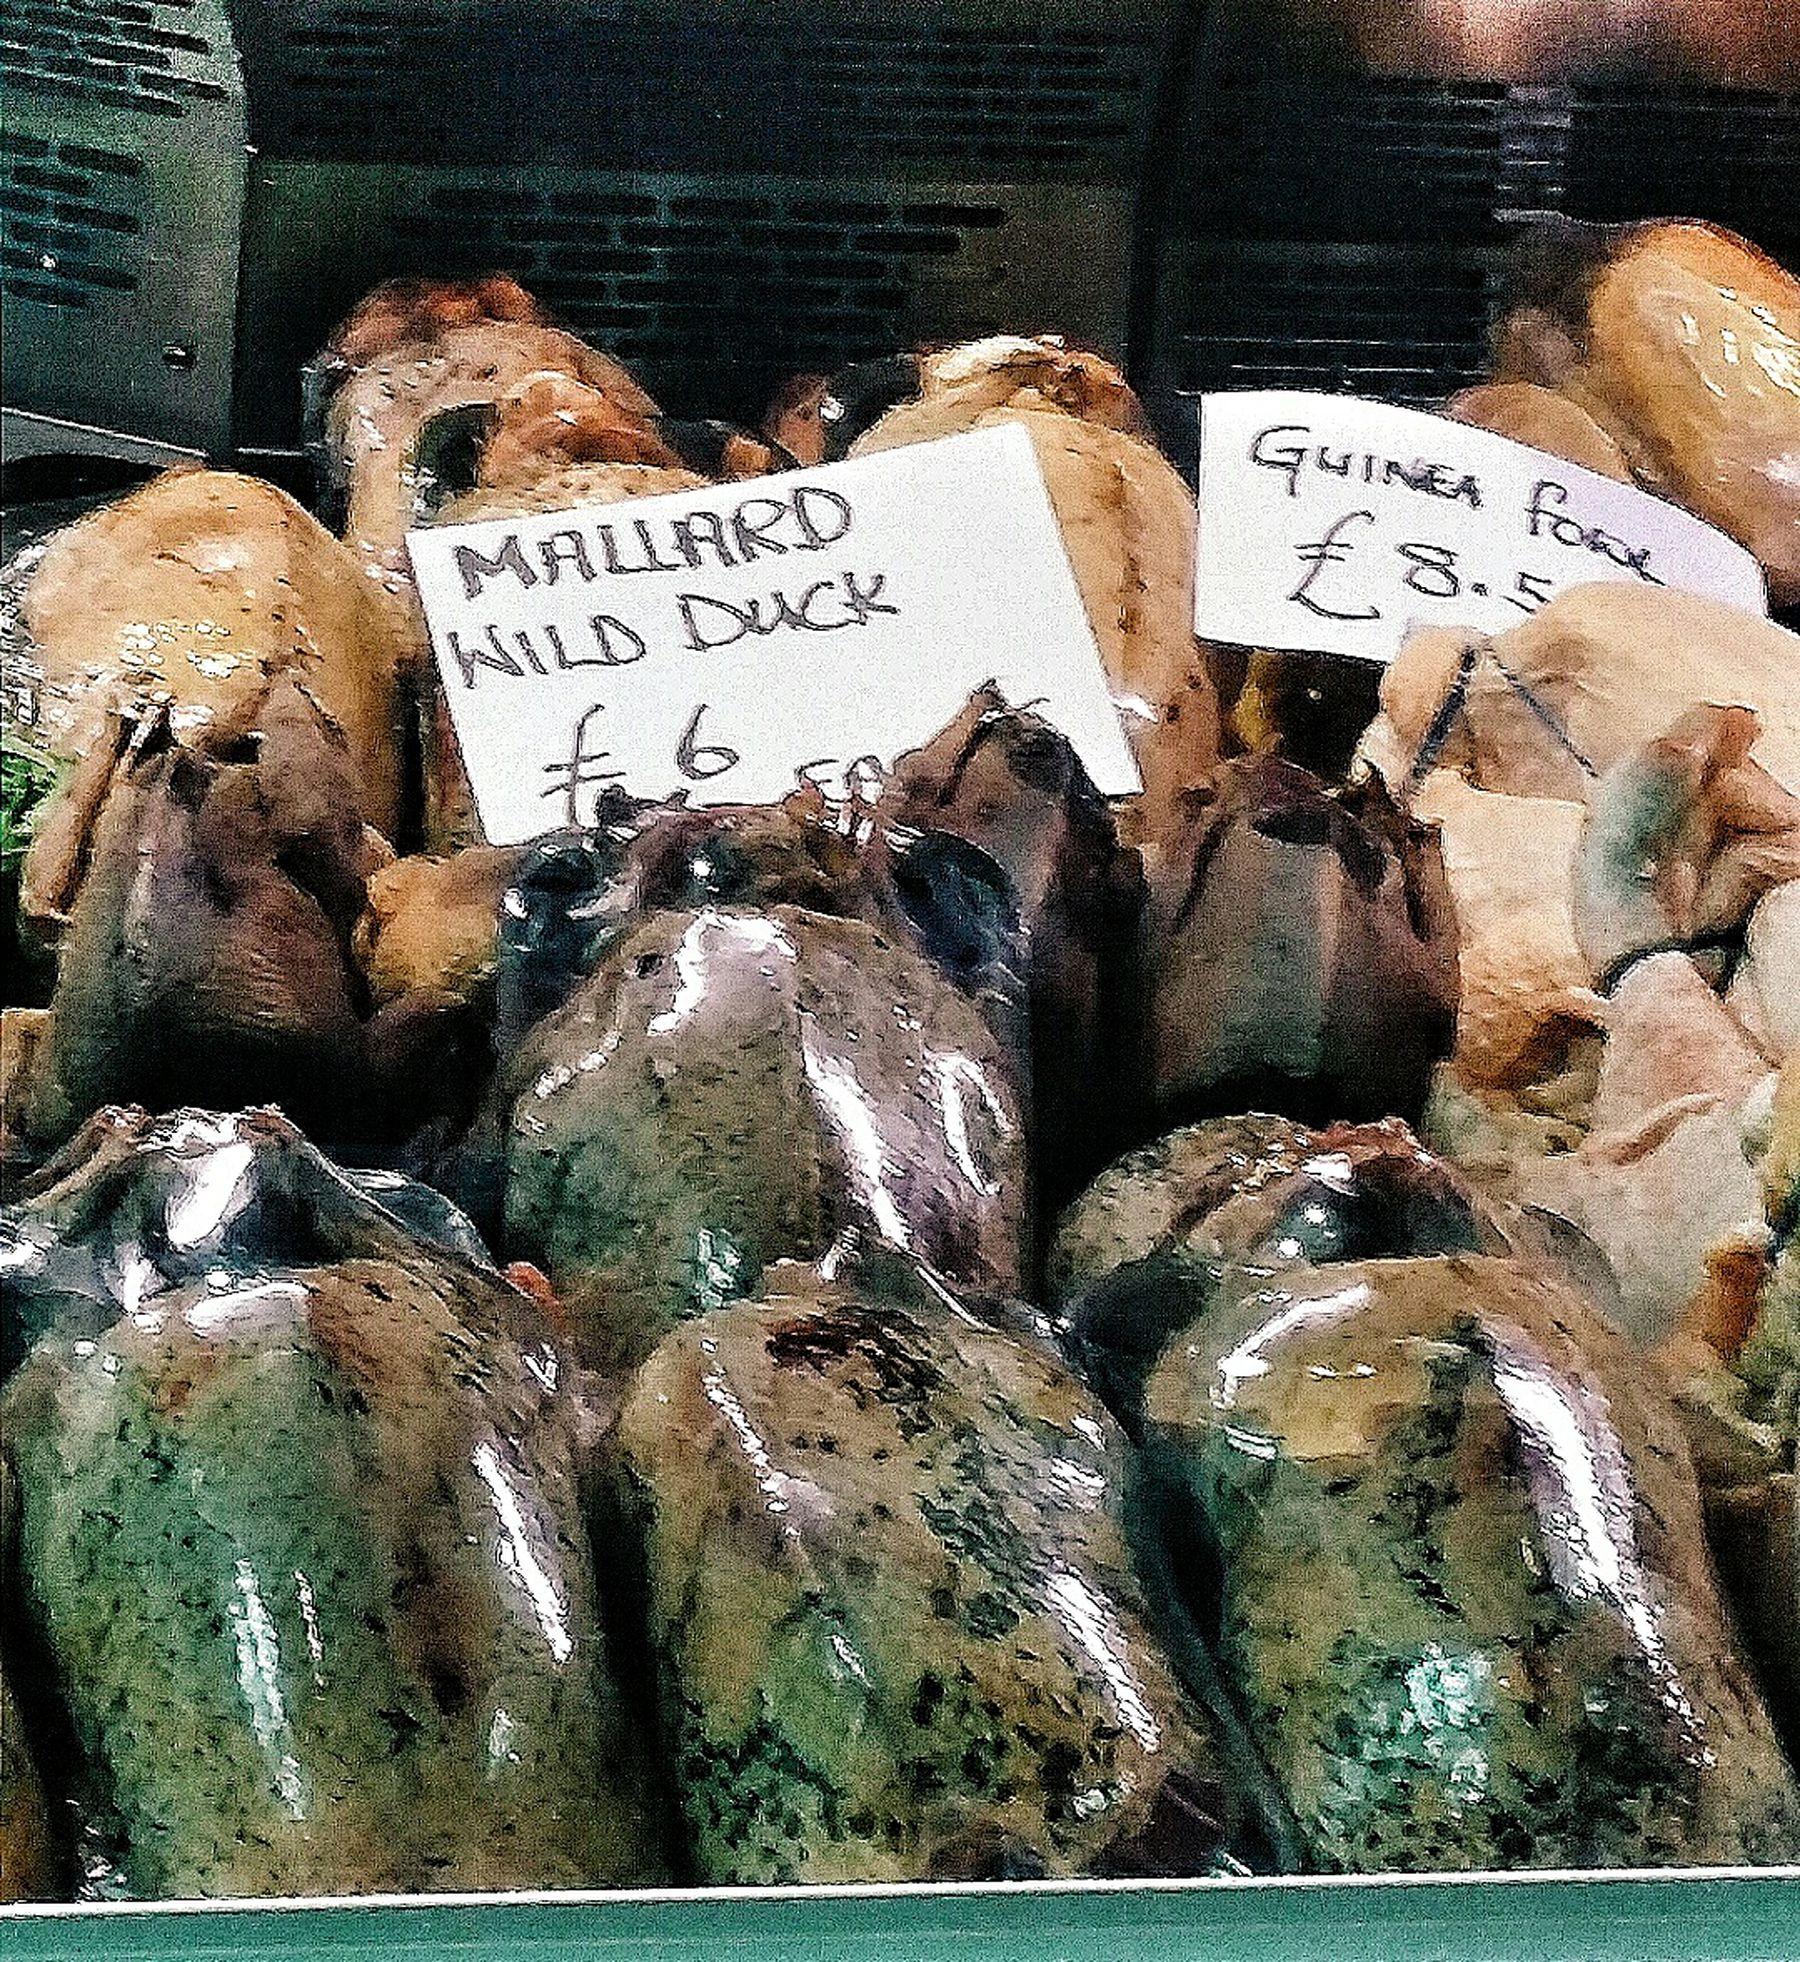 Mallard Wild Duck Guinea Fowl Specialty Food Food Market Borough Market 1014 1276 London England Travelphotogrqphy